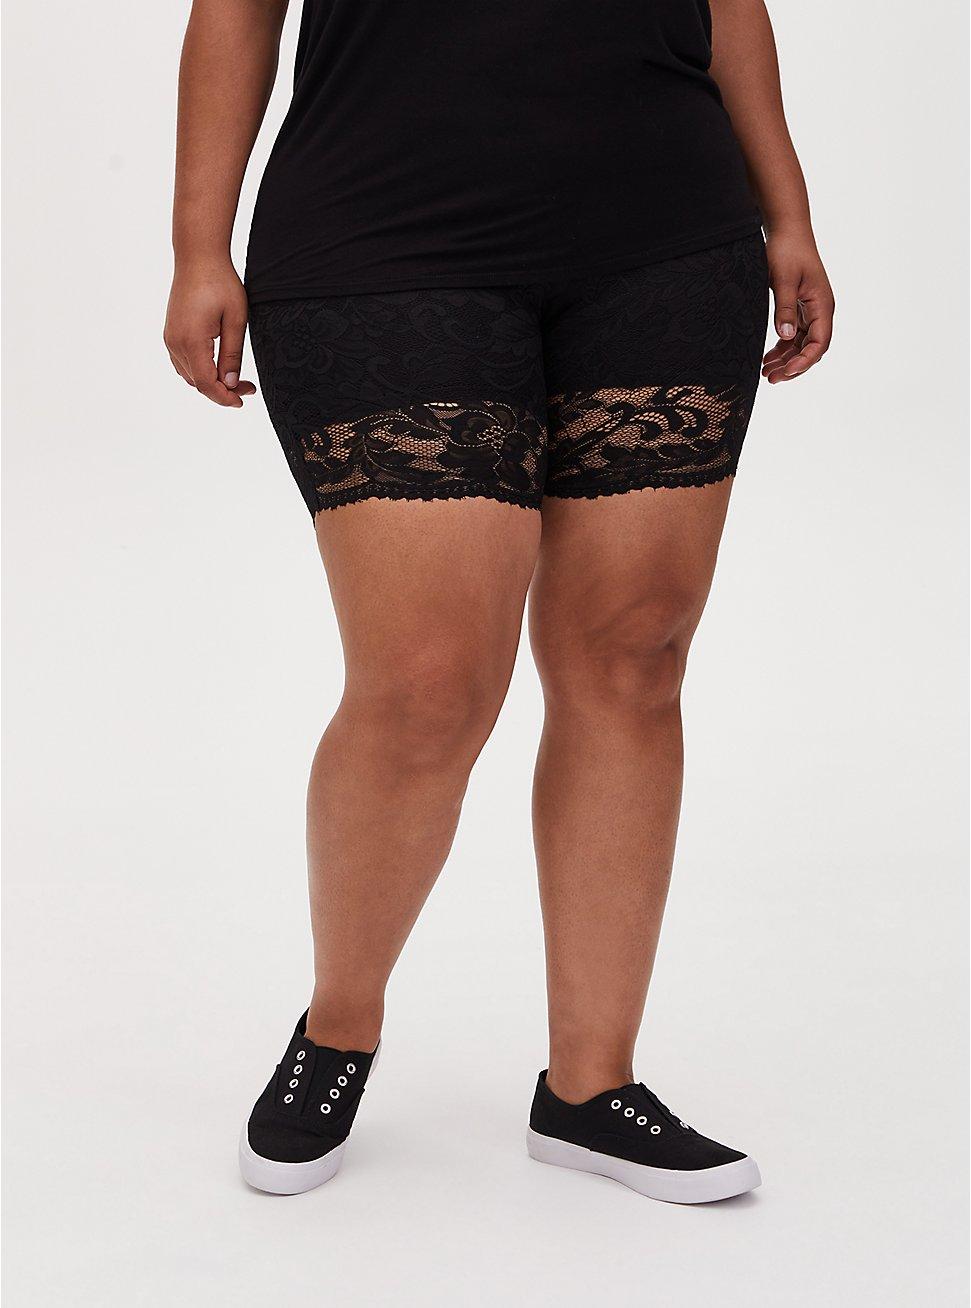 Plus Size Black Lace Bike Short, BLACK, hi-res